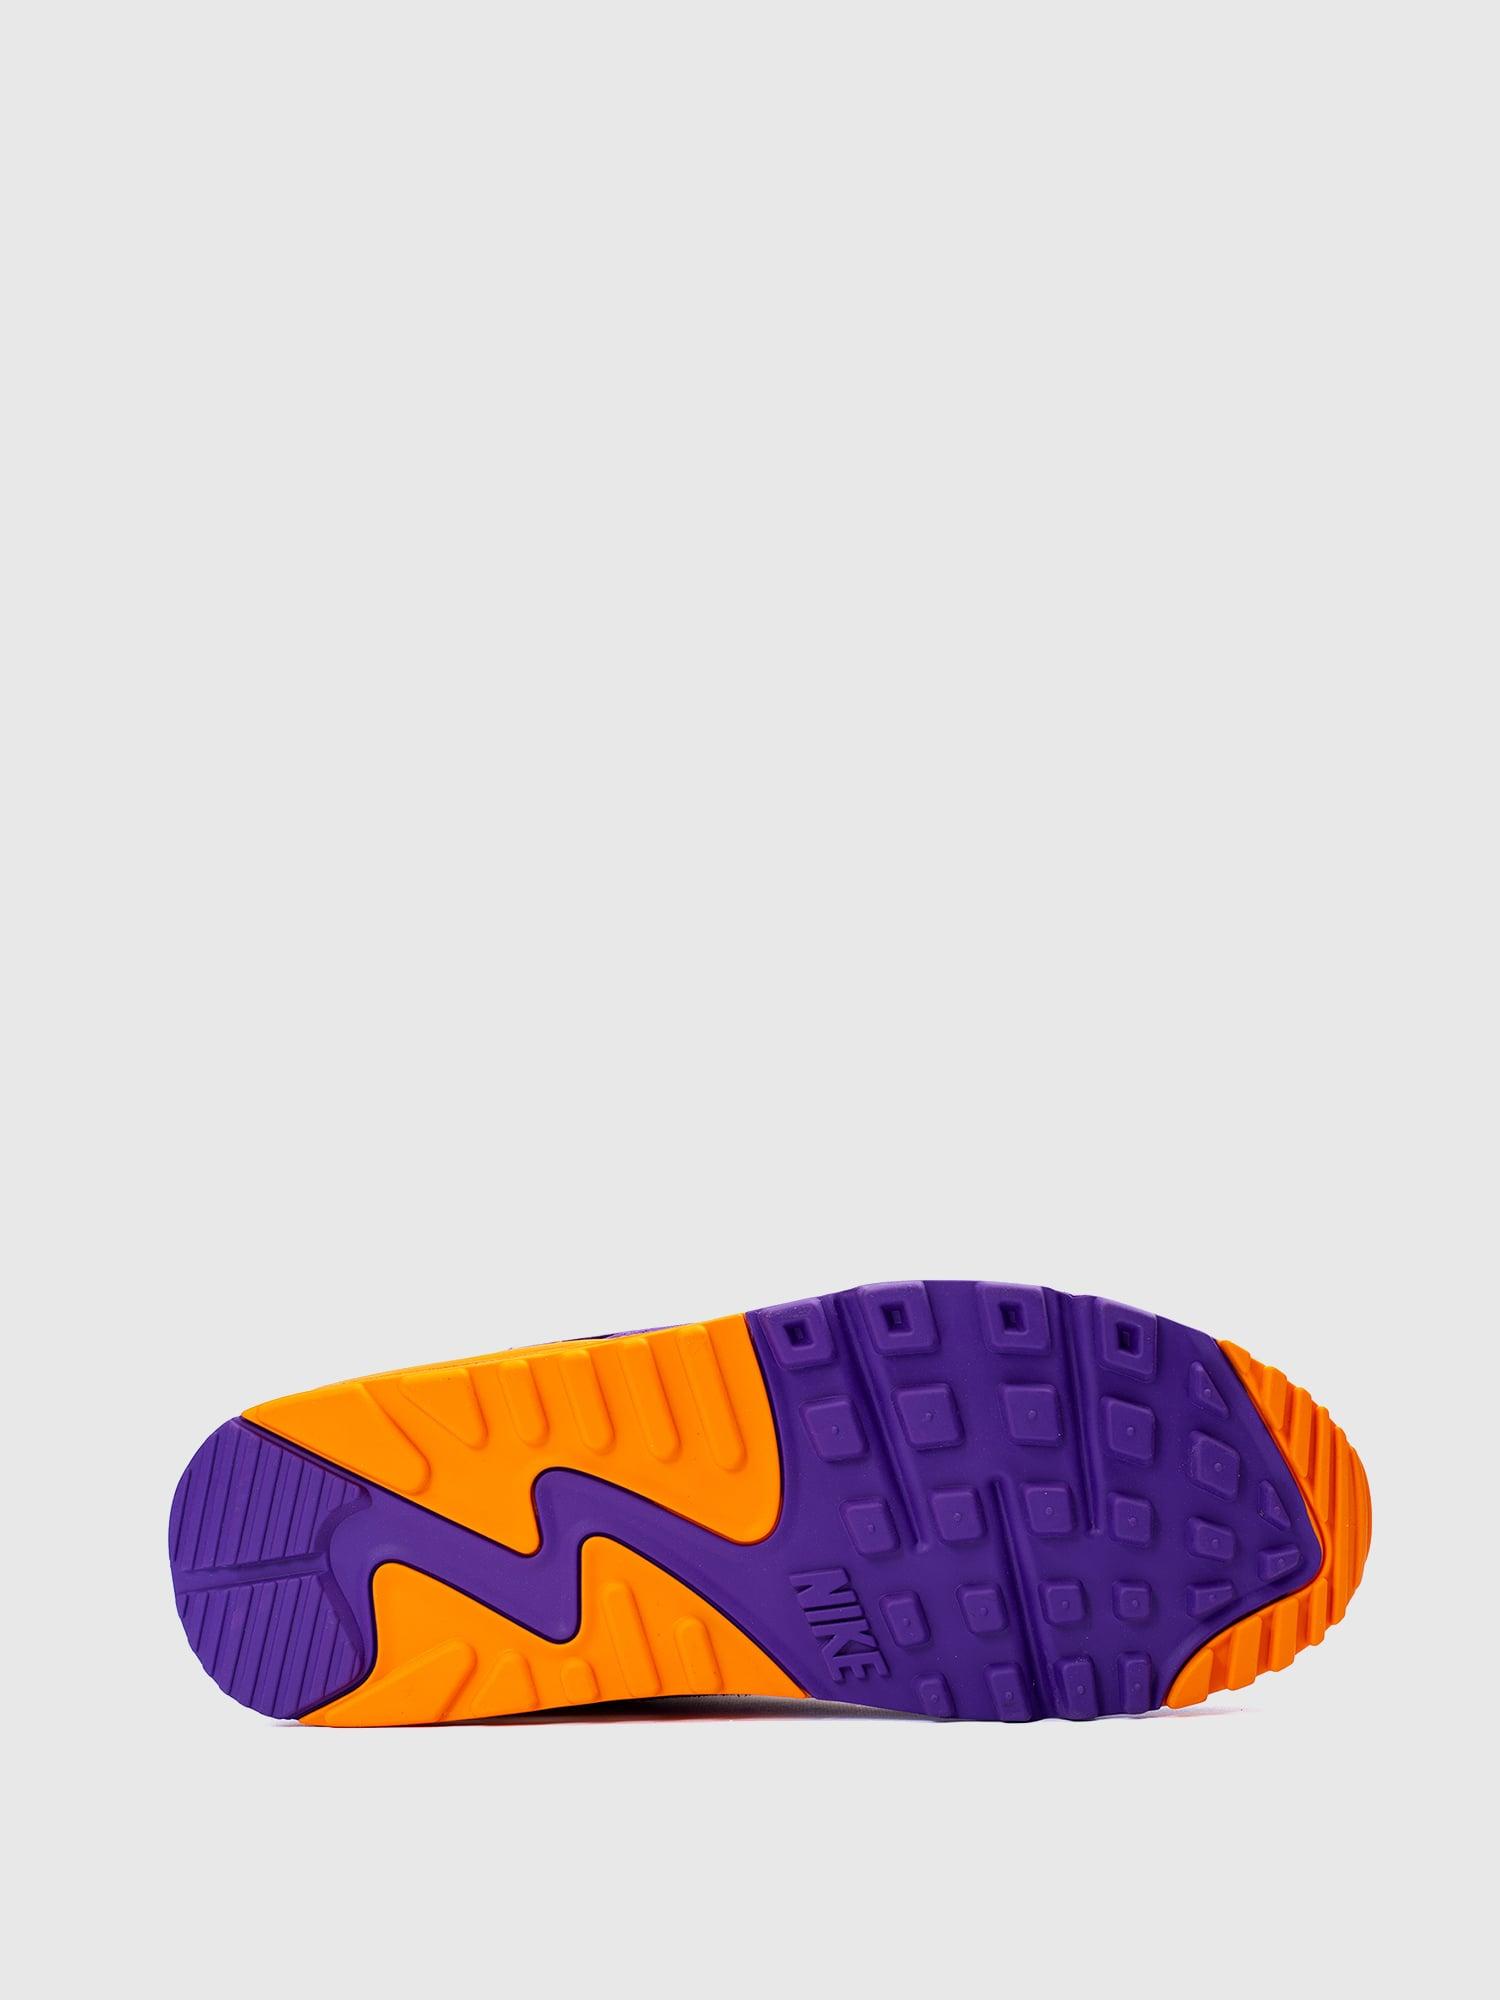 Nike Air Max 90 Viotech OG